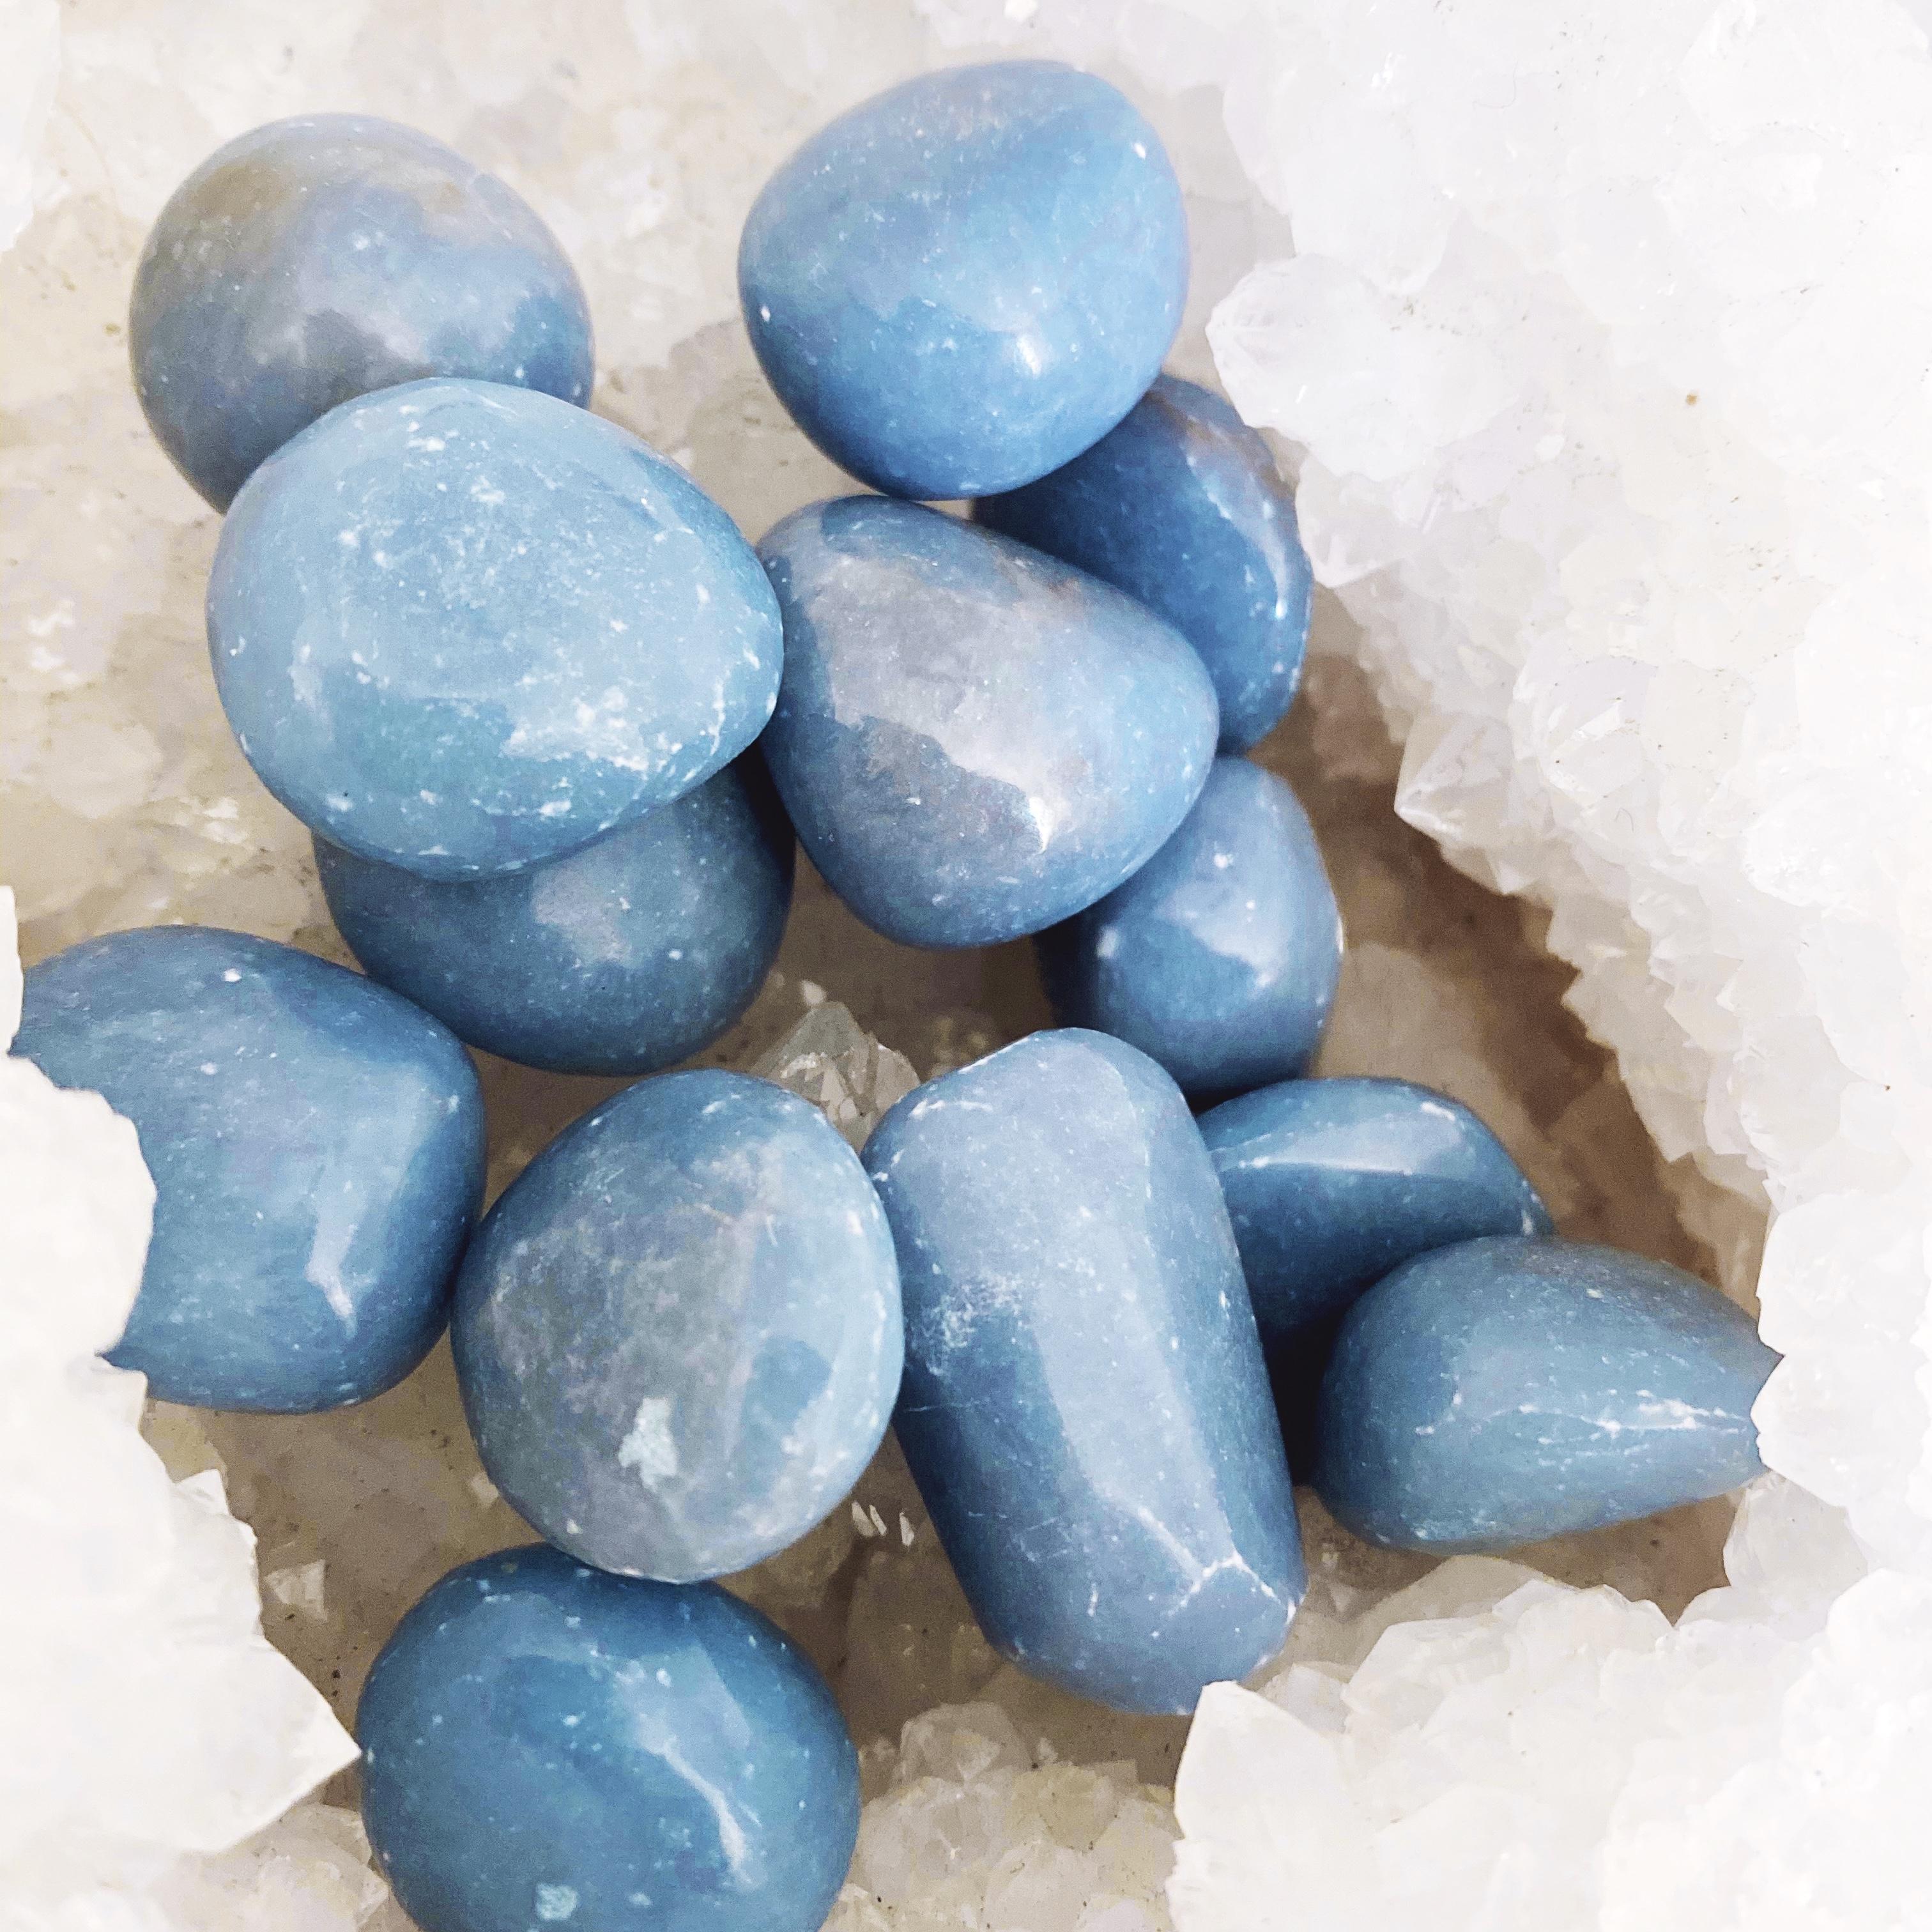 angelite crystal stone tumbled   paradise found santa barbara